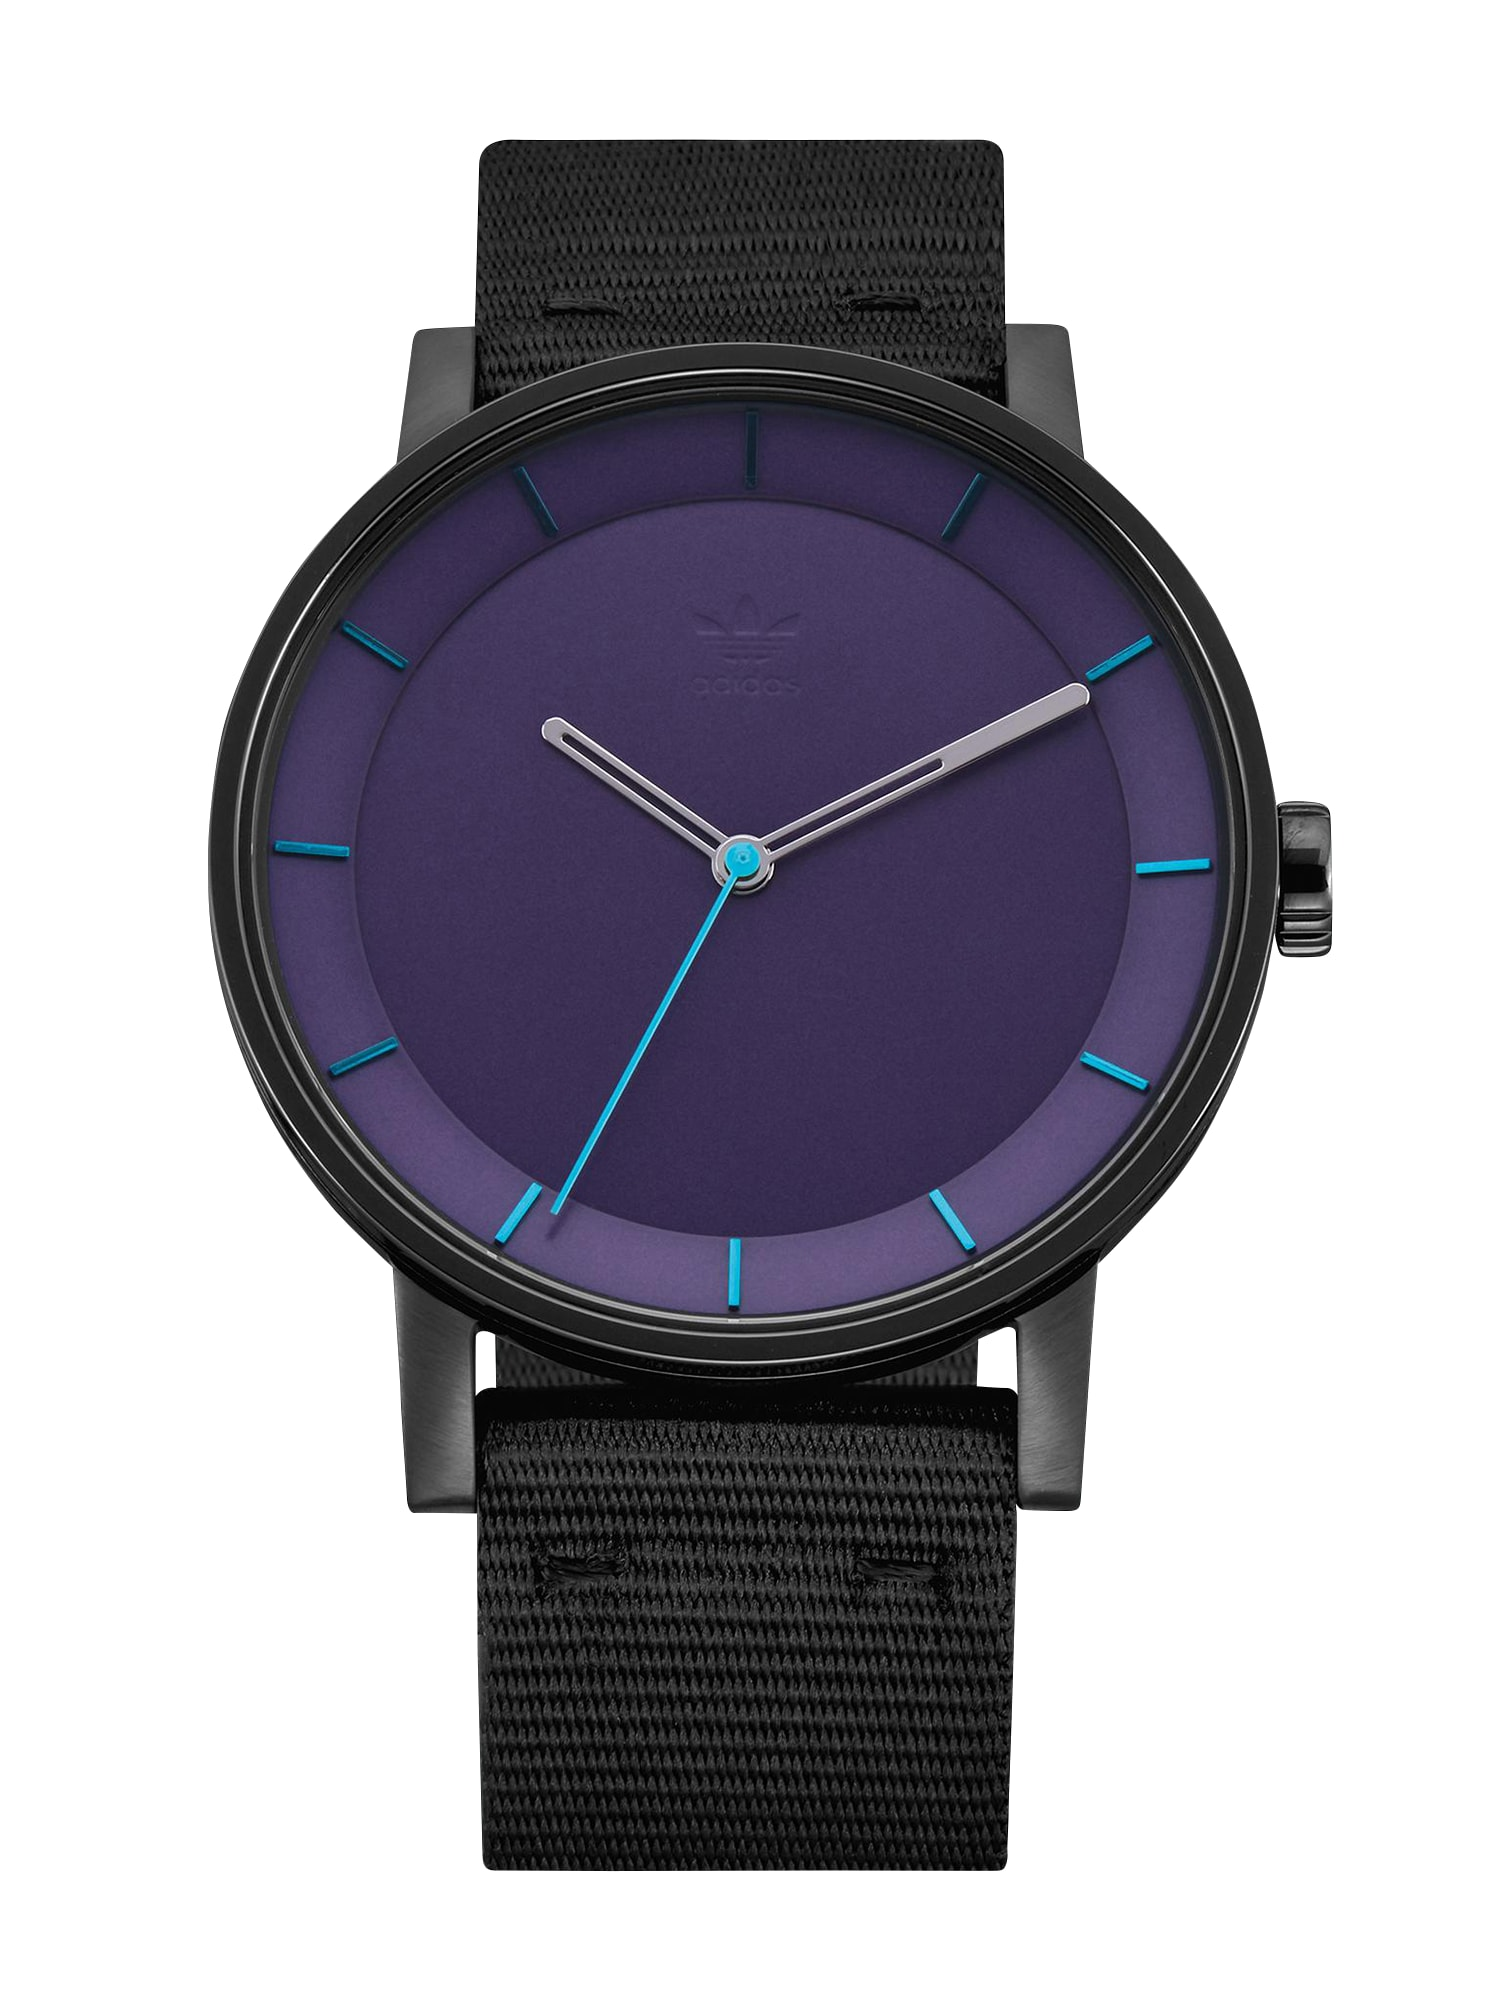 Analogové hodinky District_W1 tmavě modrá ADIDAS ORIGINALS